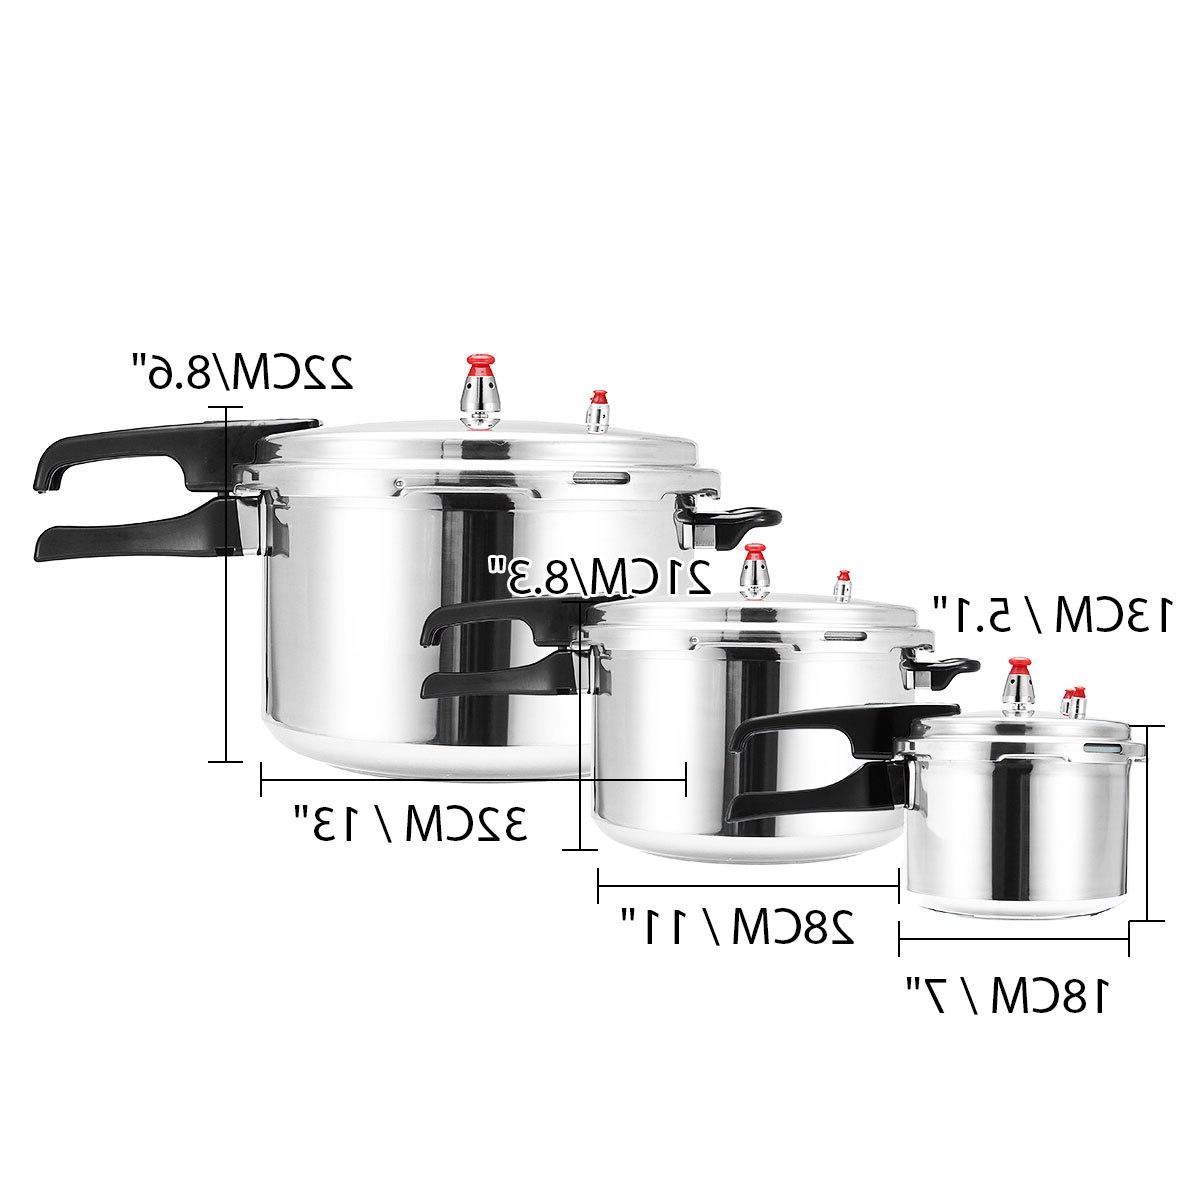 Aluminium Alloy <font><b>Pressure</b></font> <font><b>Cooker</b></font> Gas Energy-saving Safety Protection 3L/11L/17L